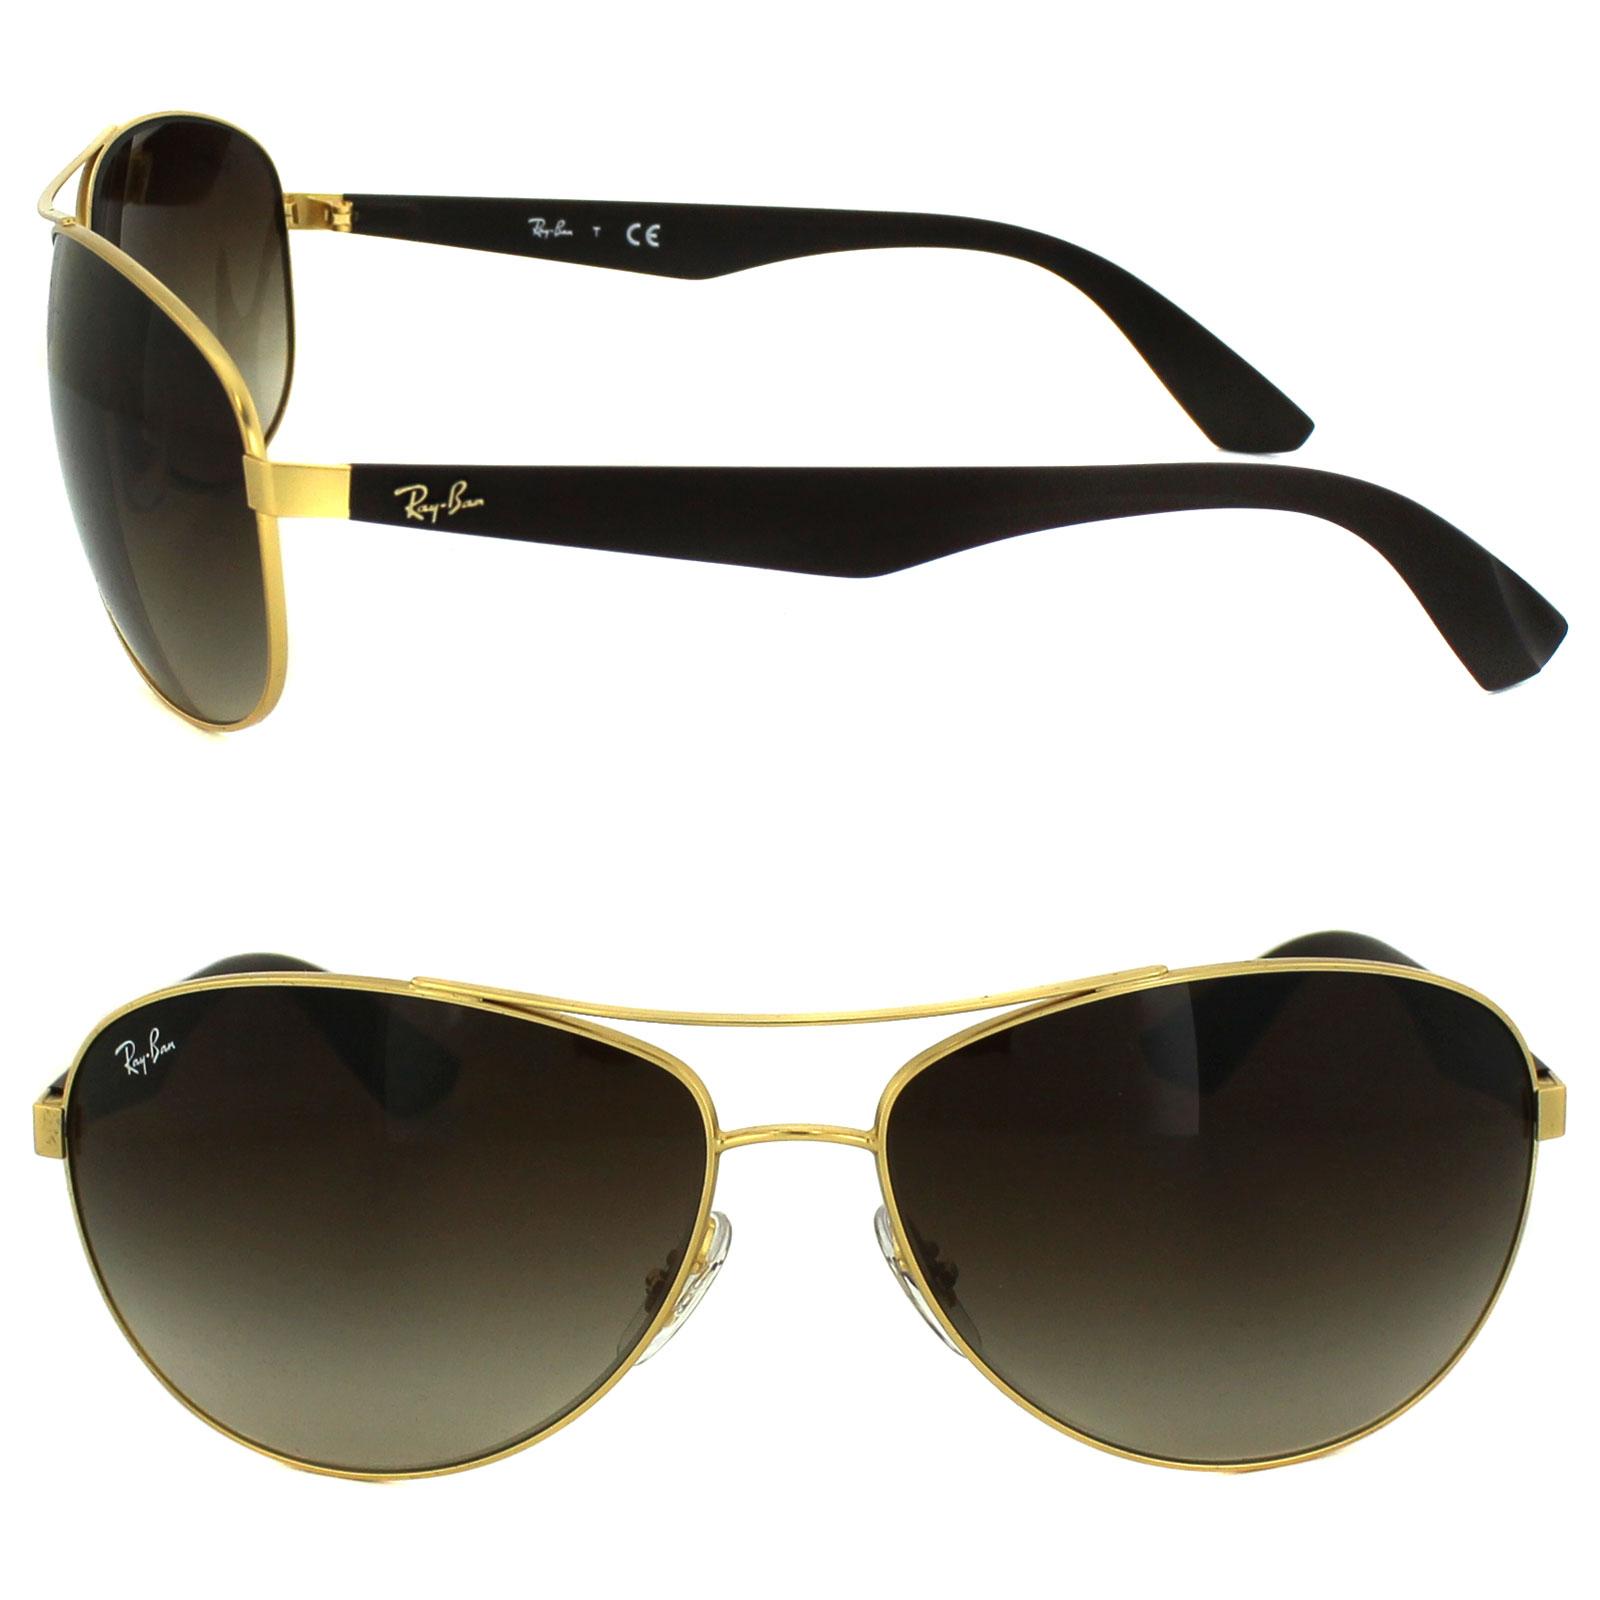 ray ban aviator arista soee  ray-ban aviator sunglasses arista 59 cadillac